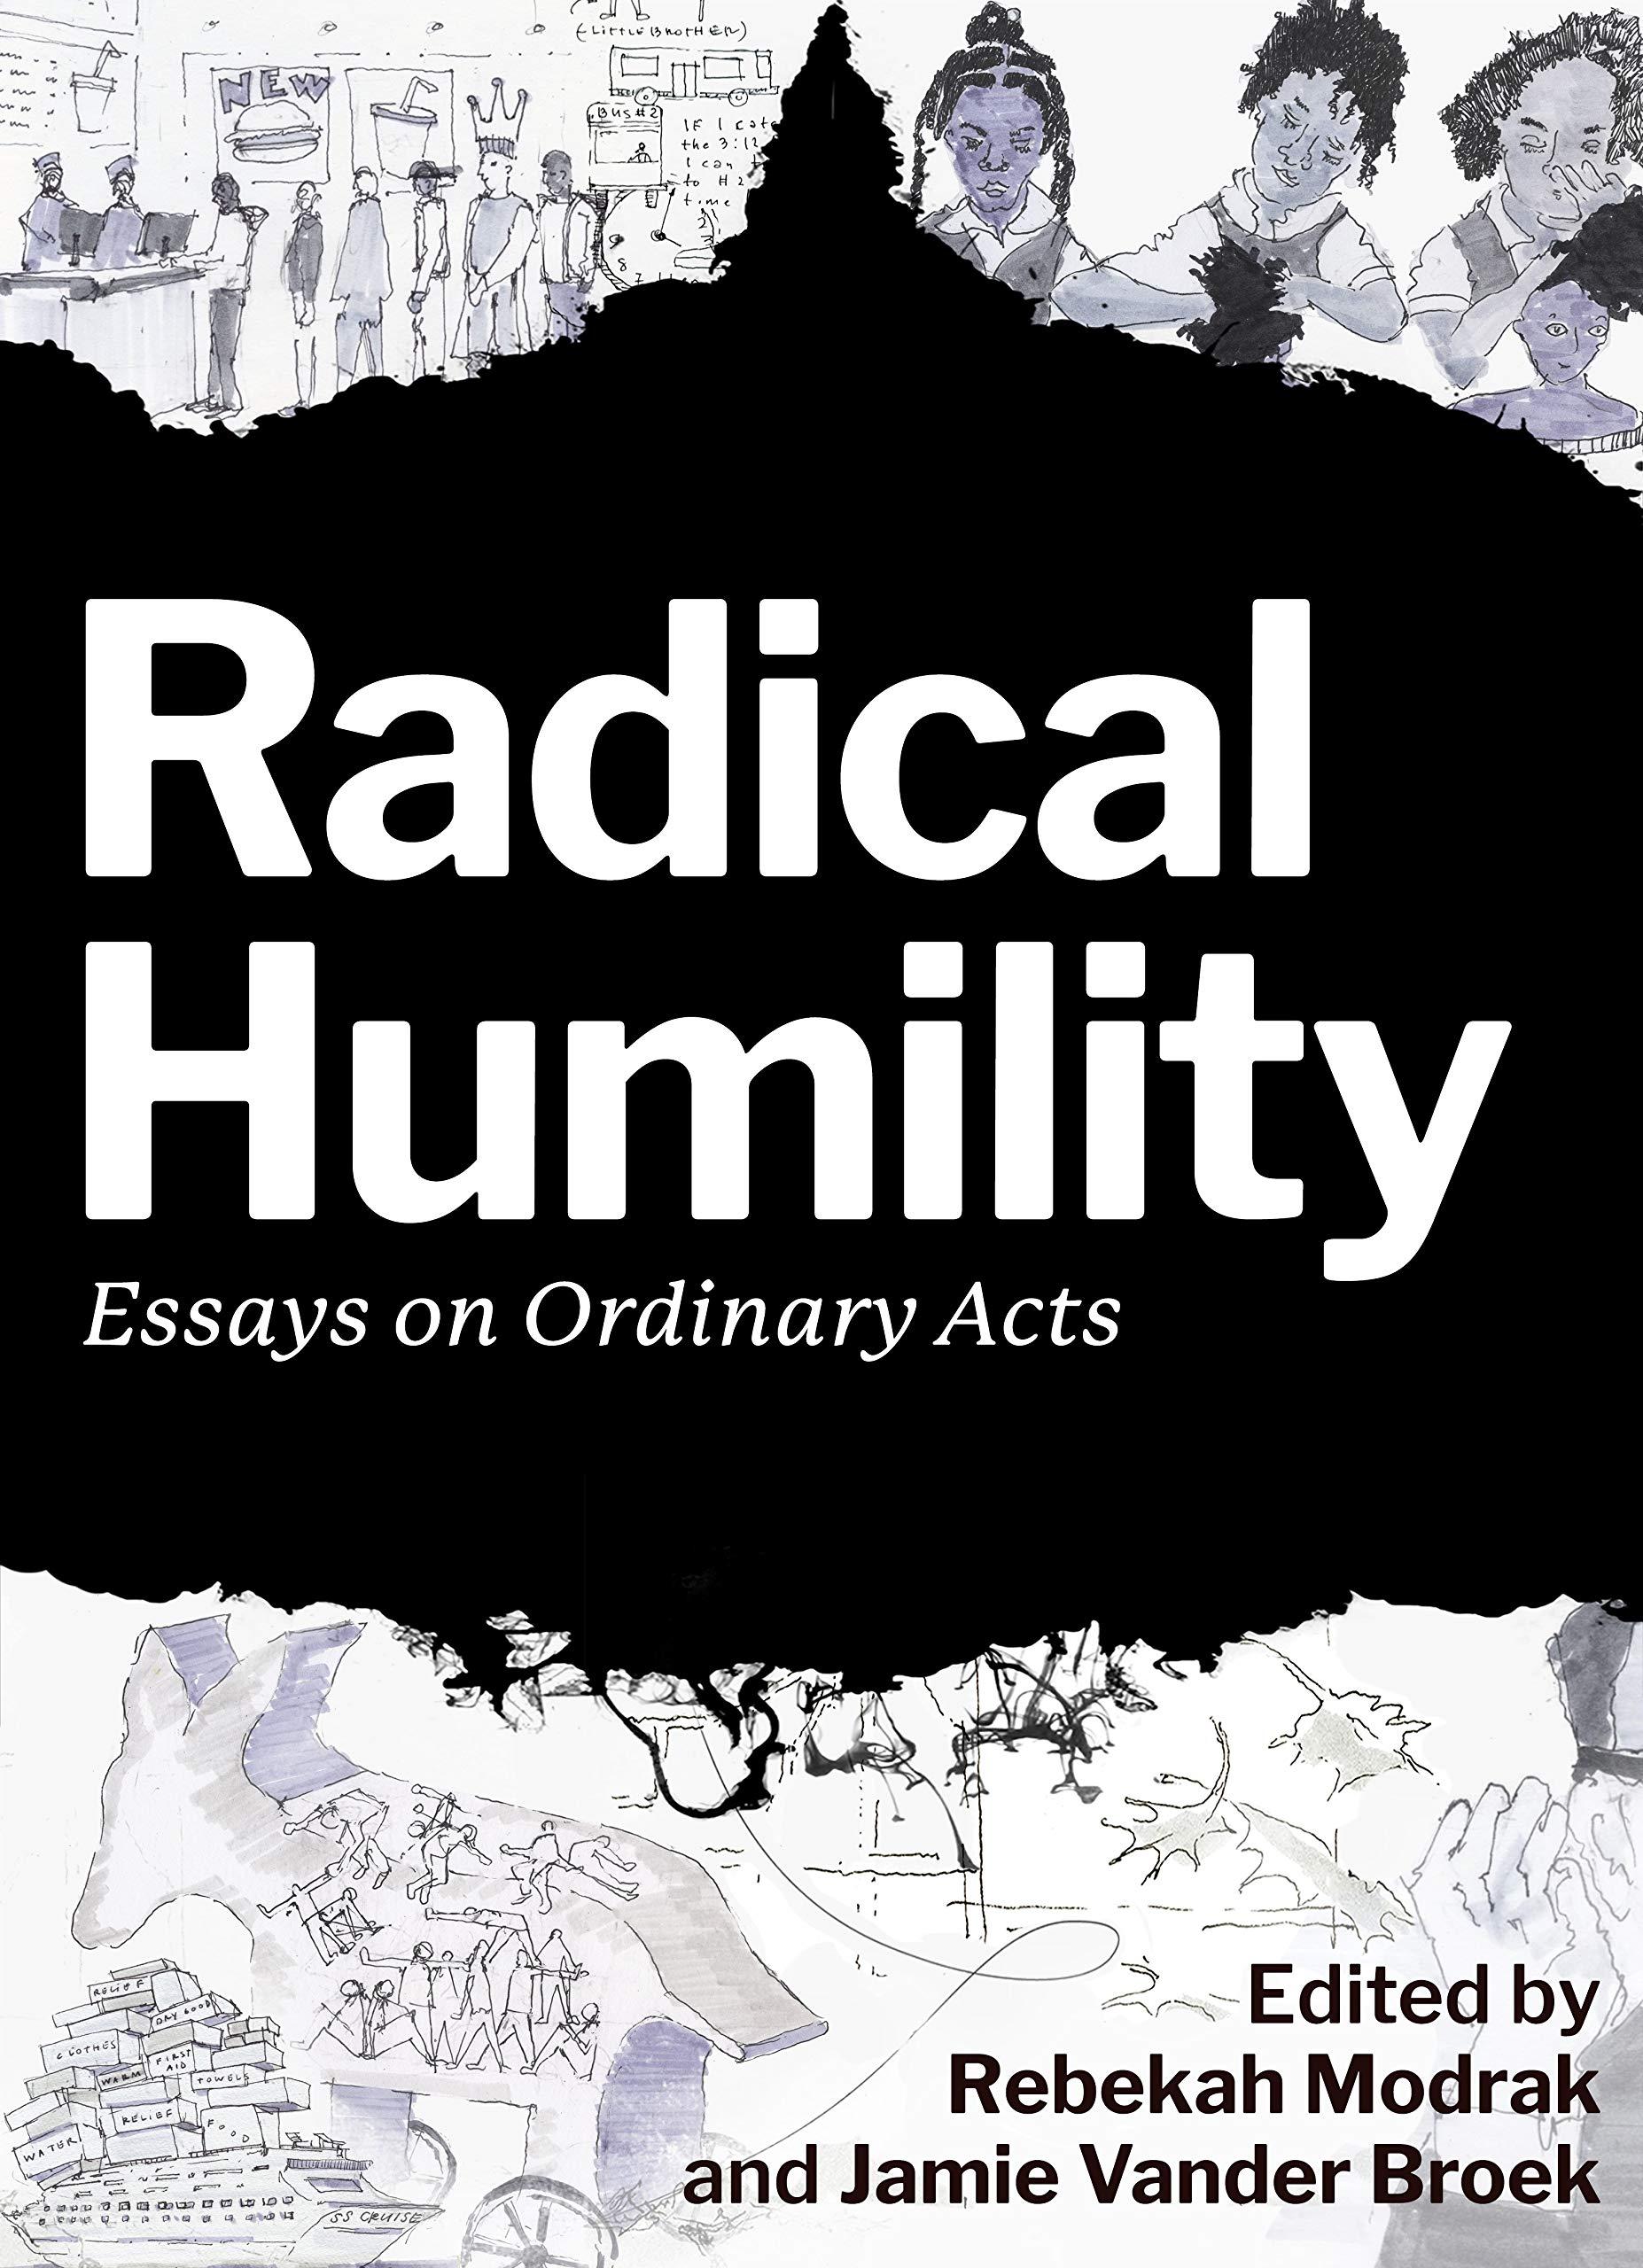 Radical Humility: Essays on Ordinary Acts: Amazon.co.uk: Modrak, Rebekah, Vander  Broek, Jamie Lausch, Ahuvia, Aaron, Belk, Russell, Blow, Charles, Boothman,  Richard C, Brown, Ruth Nicole, Buss, Sarah, Callard, Agnes, Clemetson,  Lynette, Danienta,